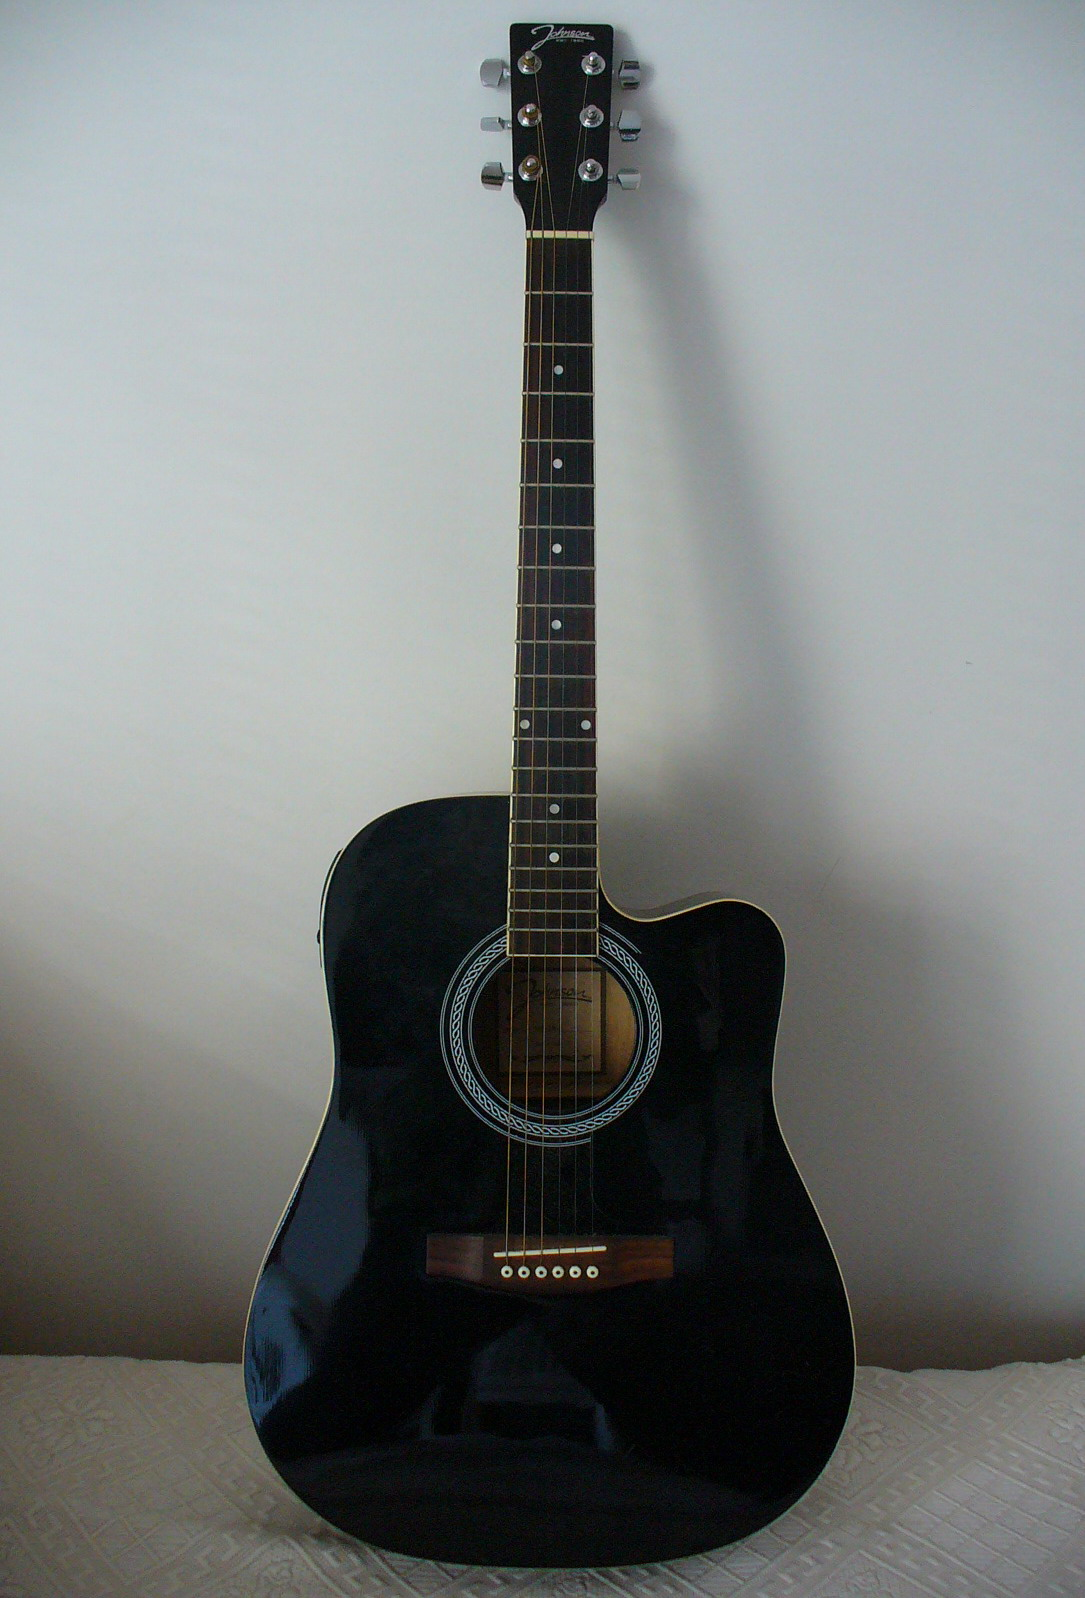 file johnson electric acoustic guitar wikipedia. Black Bedroom Furniture Sets. Home Design Ideas